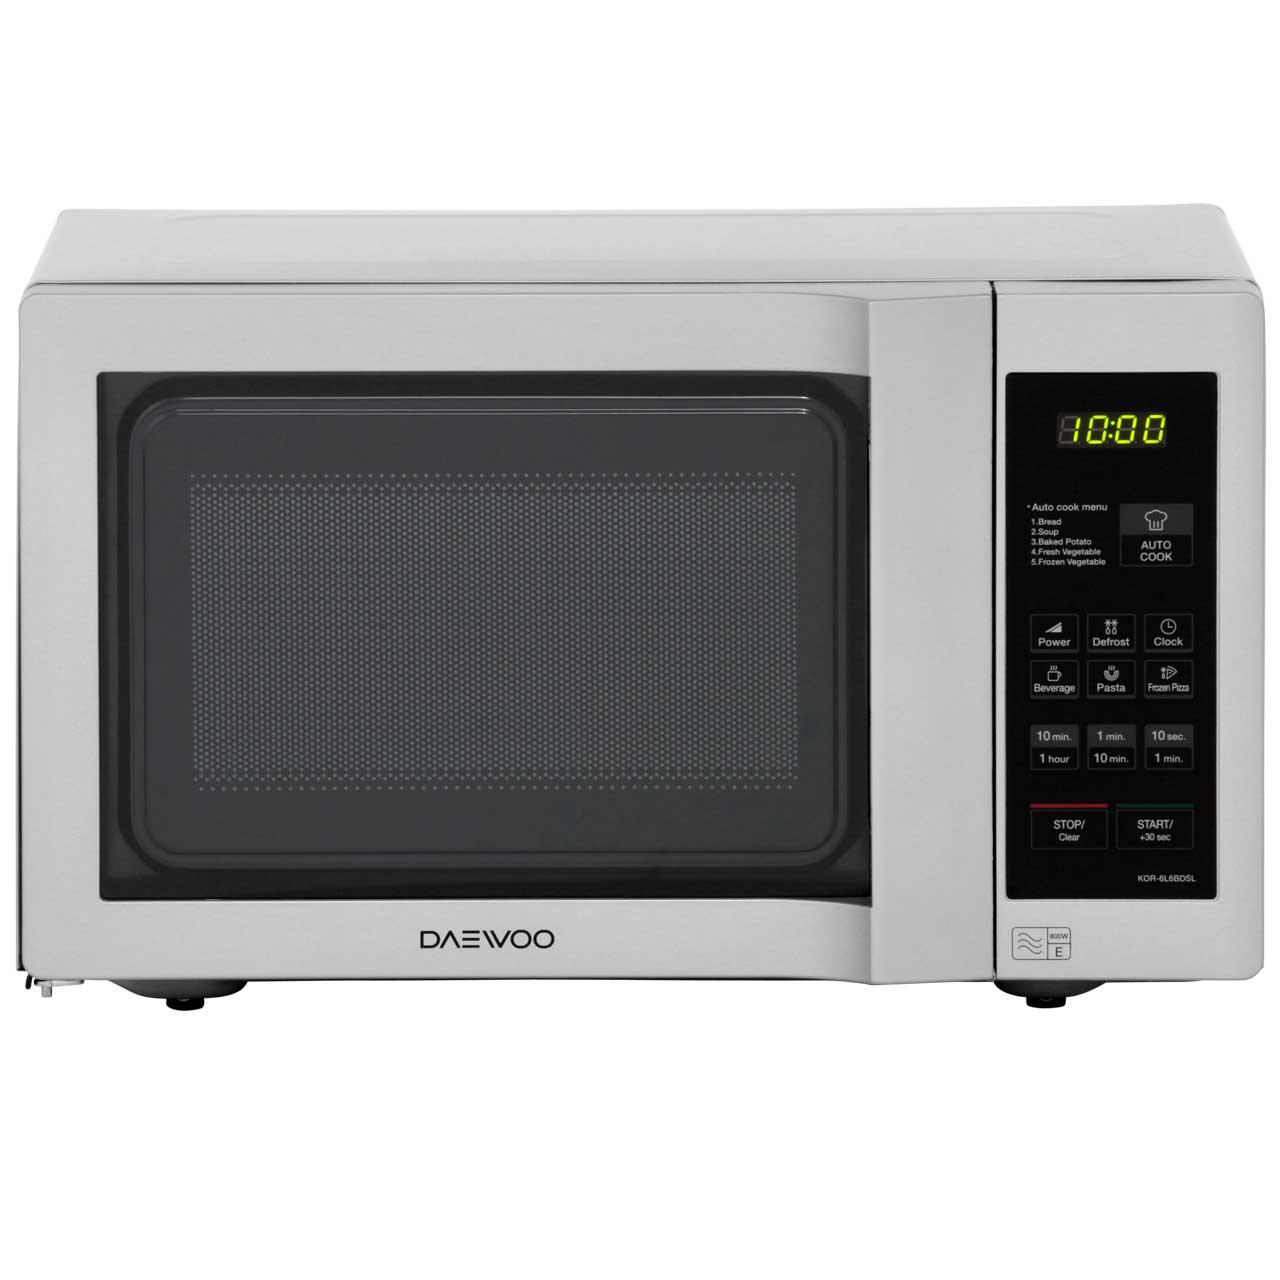 KOR6L6BDSL_SI | Daewoo Microwave Oven | 20L | ao.com